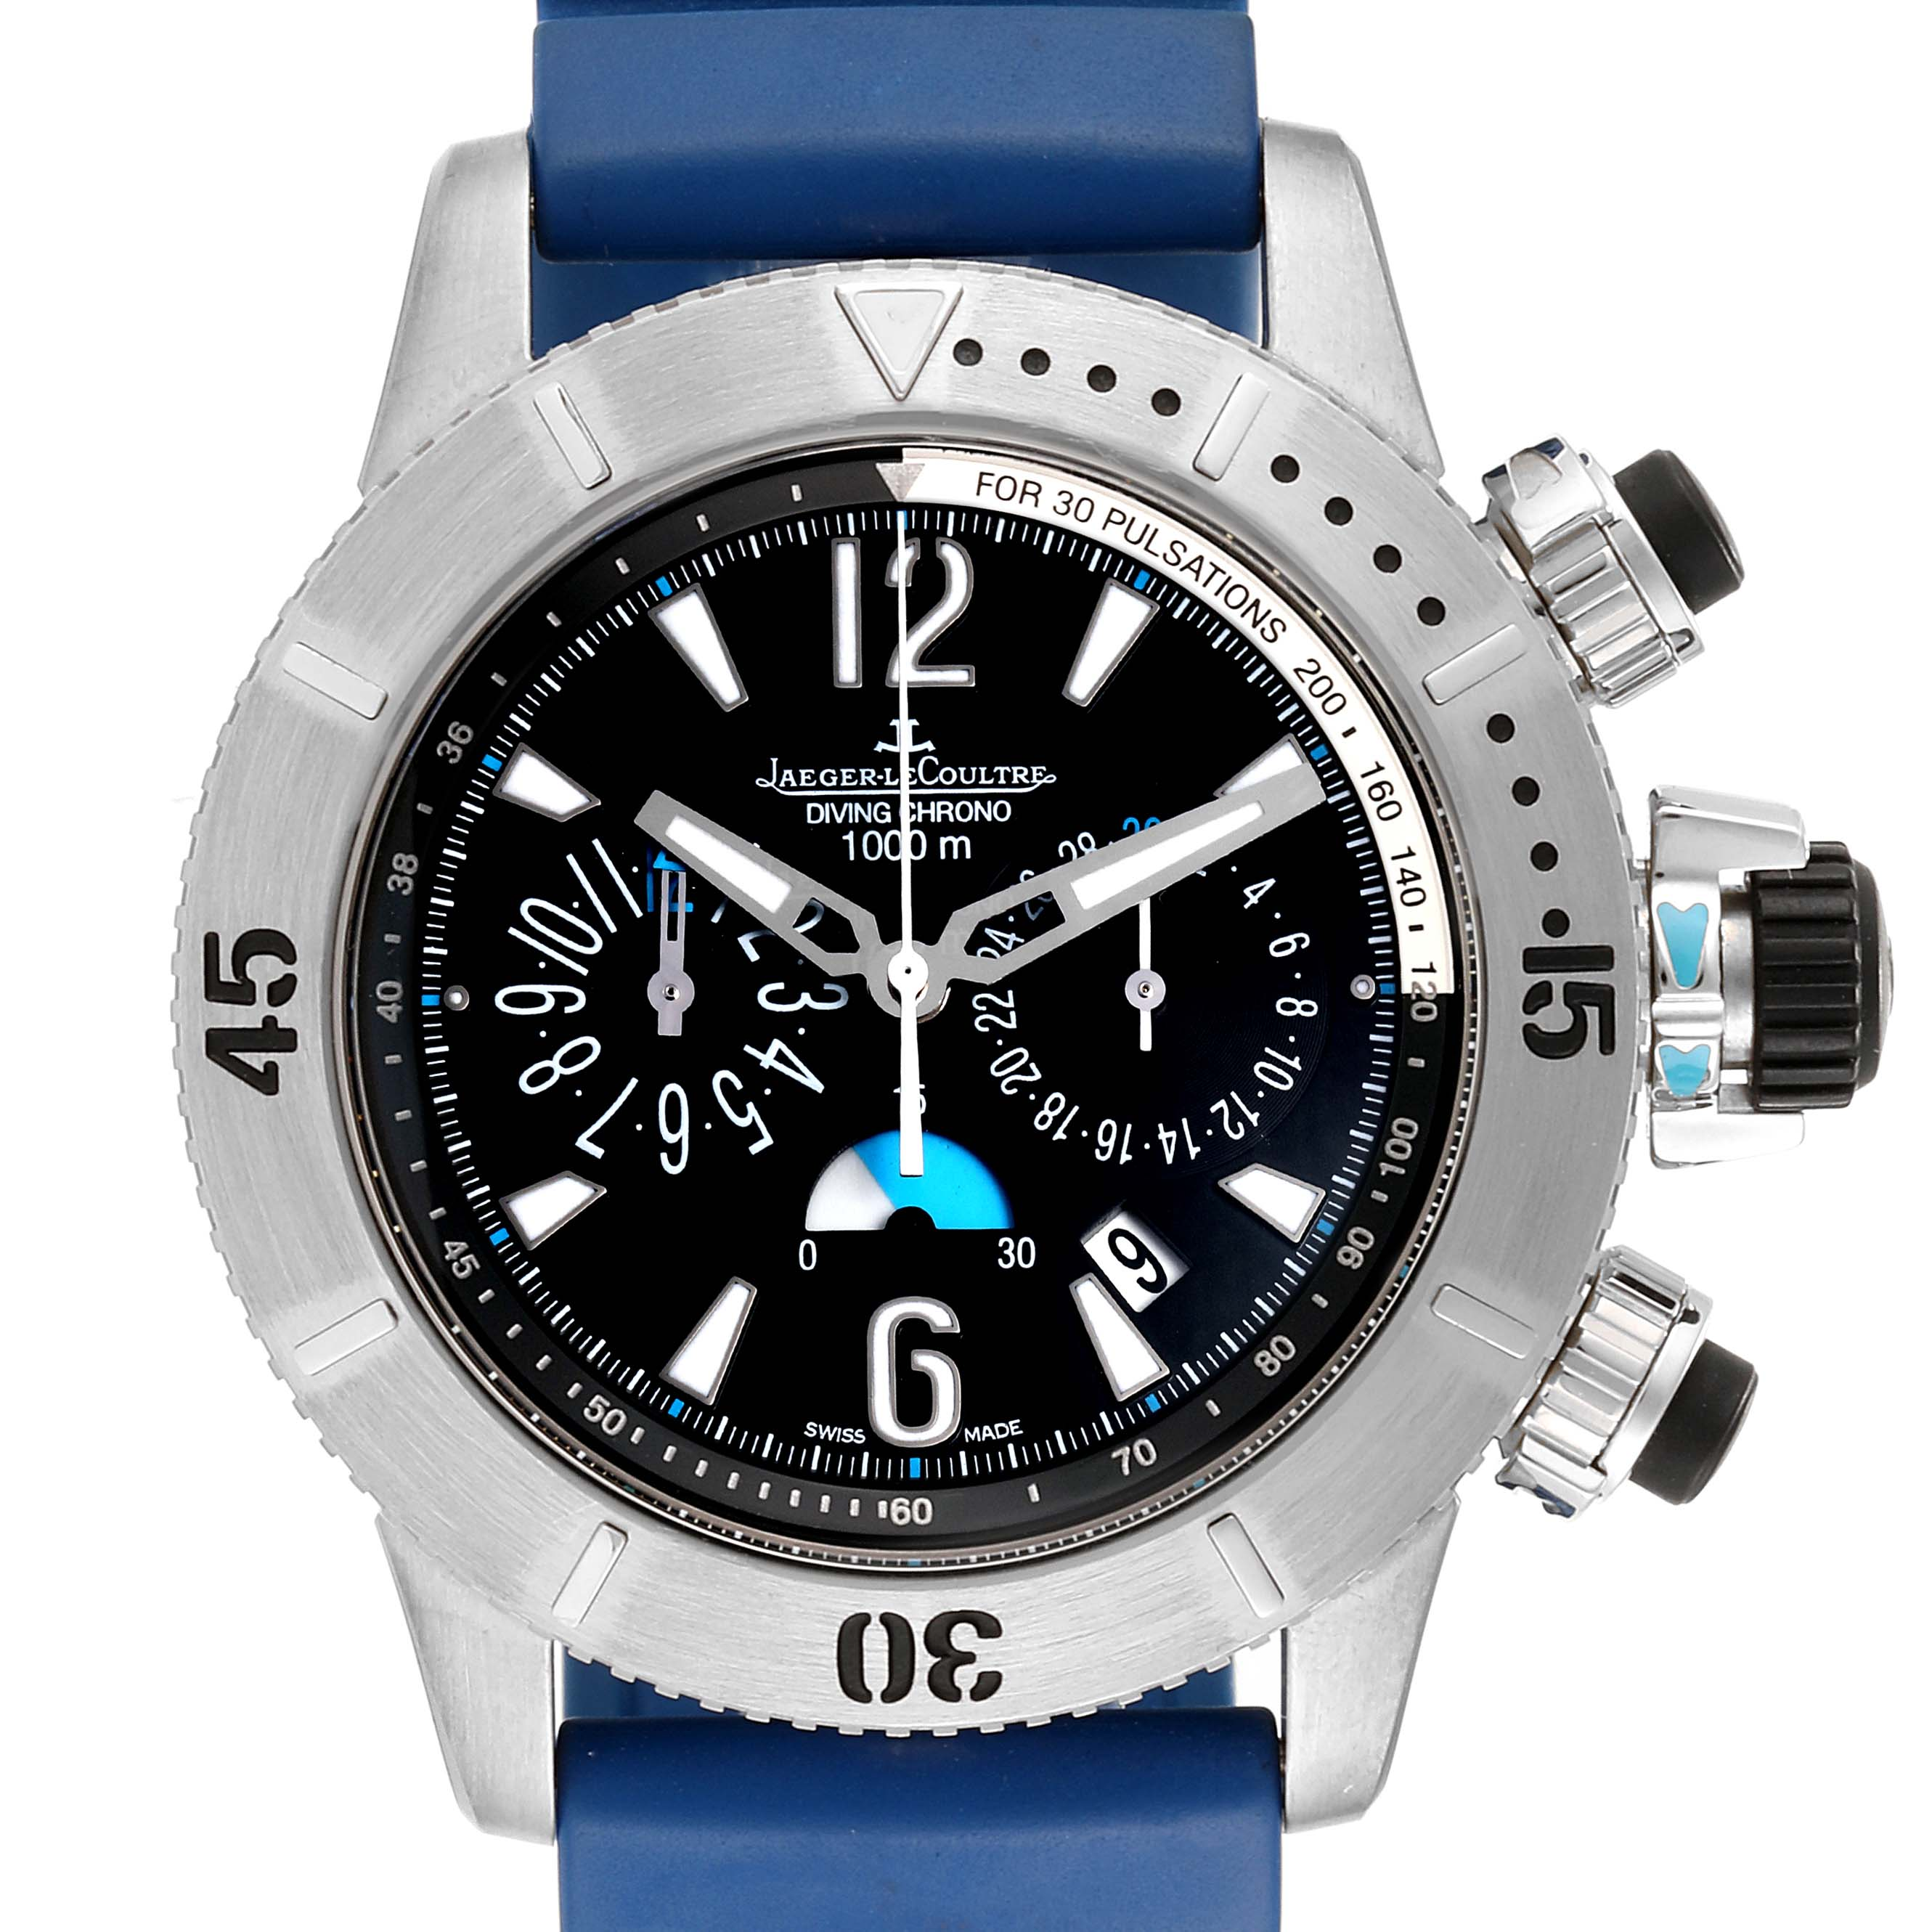 Jaeger Lecoultre Master Compressor Diving Chrono Titanium Watch 160.T.25